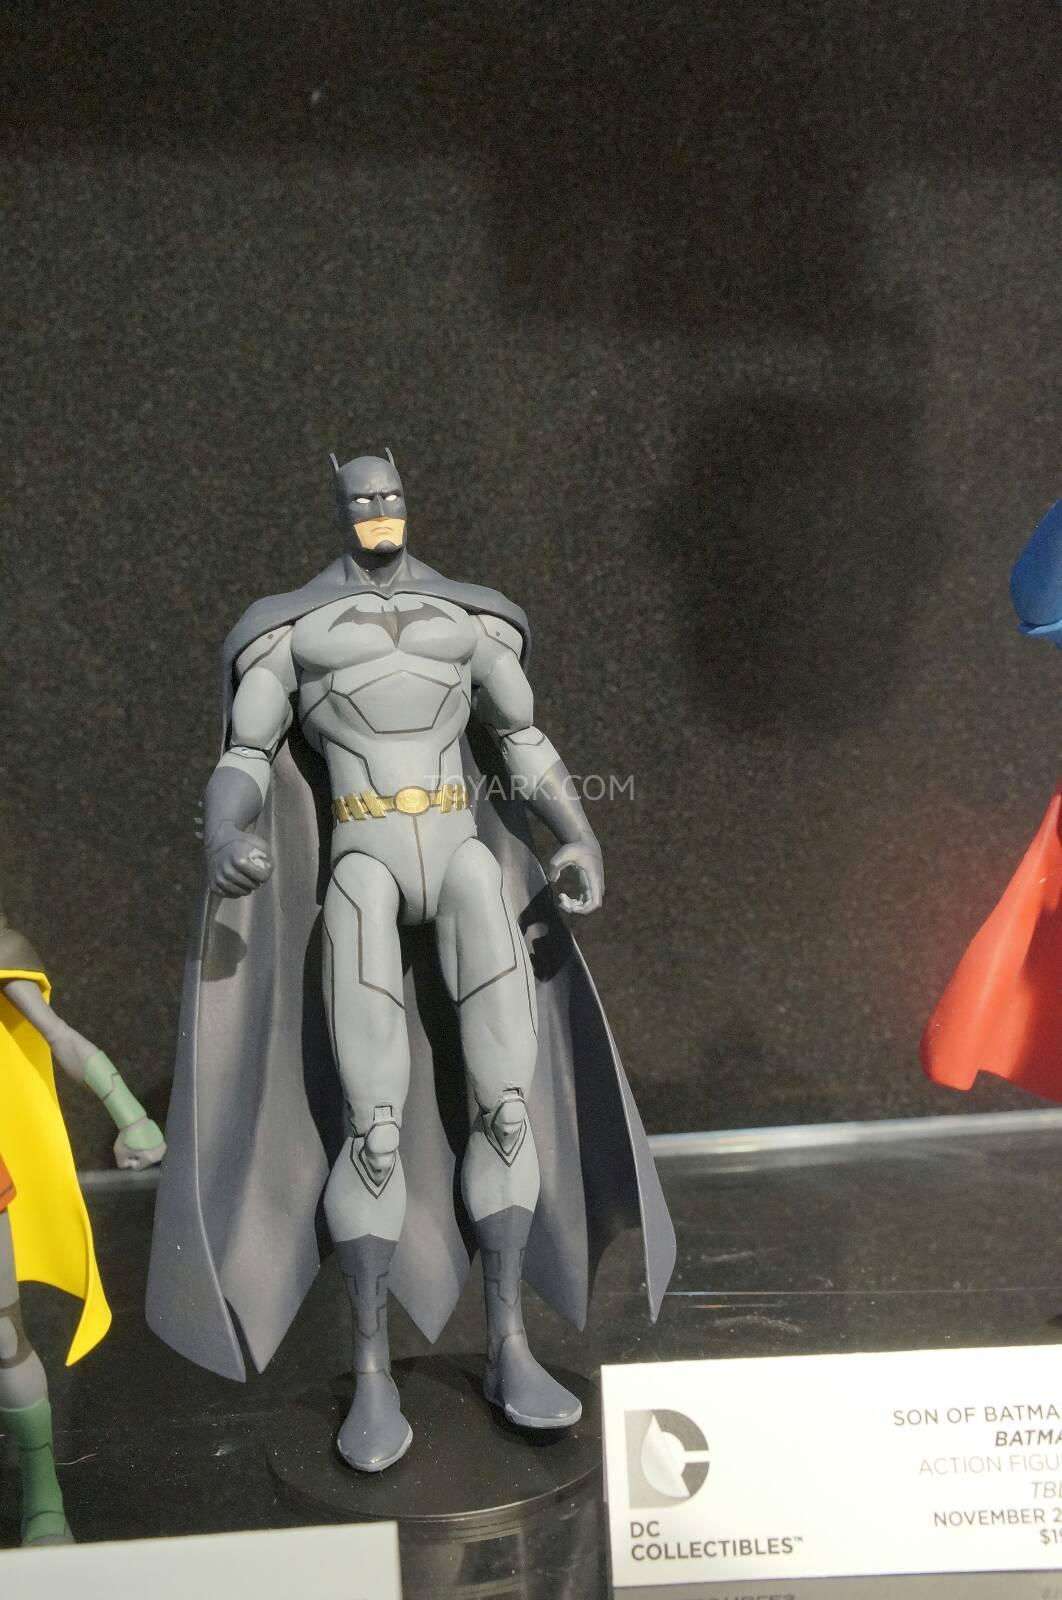 [Toy Fair 2014] DC Collectibles Toy-Fair-2014-DC-Collectibles-115